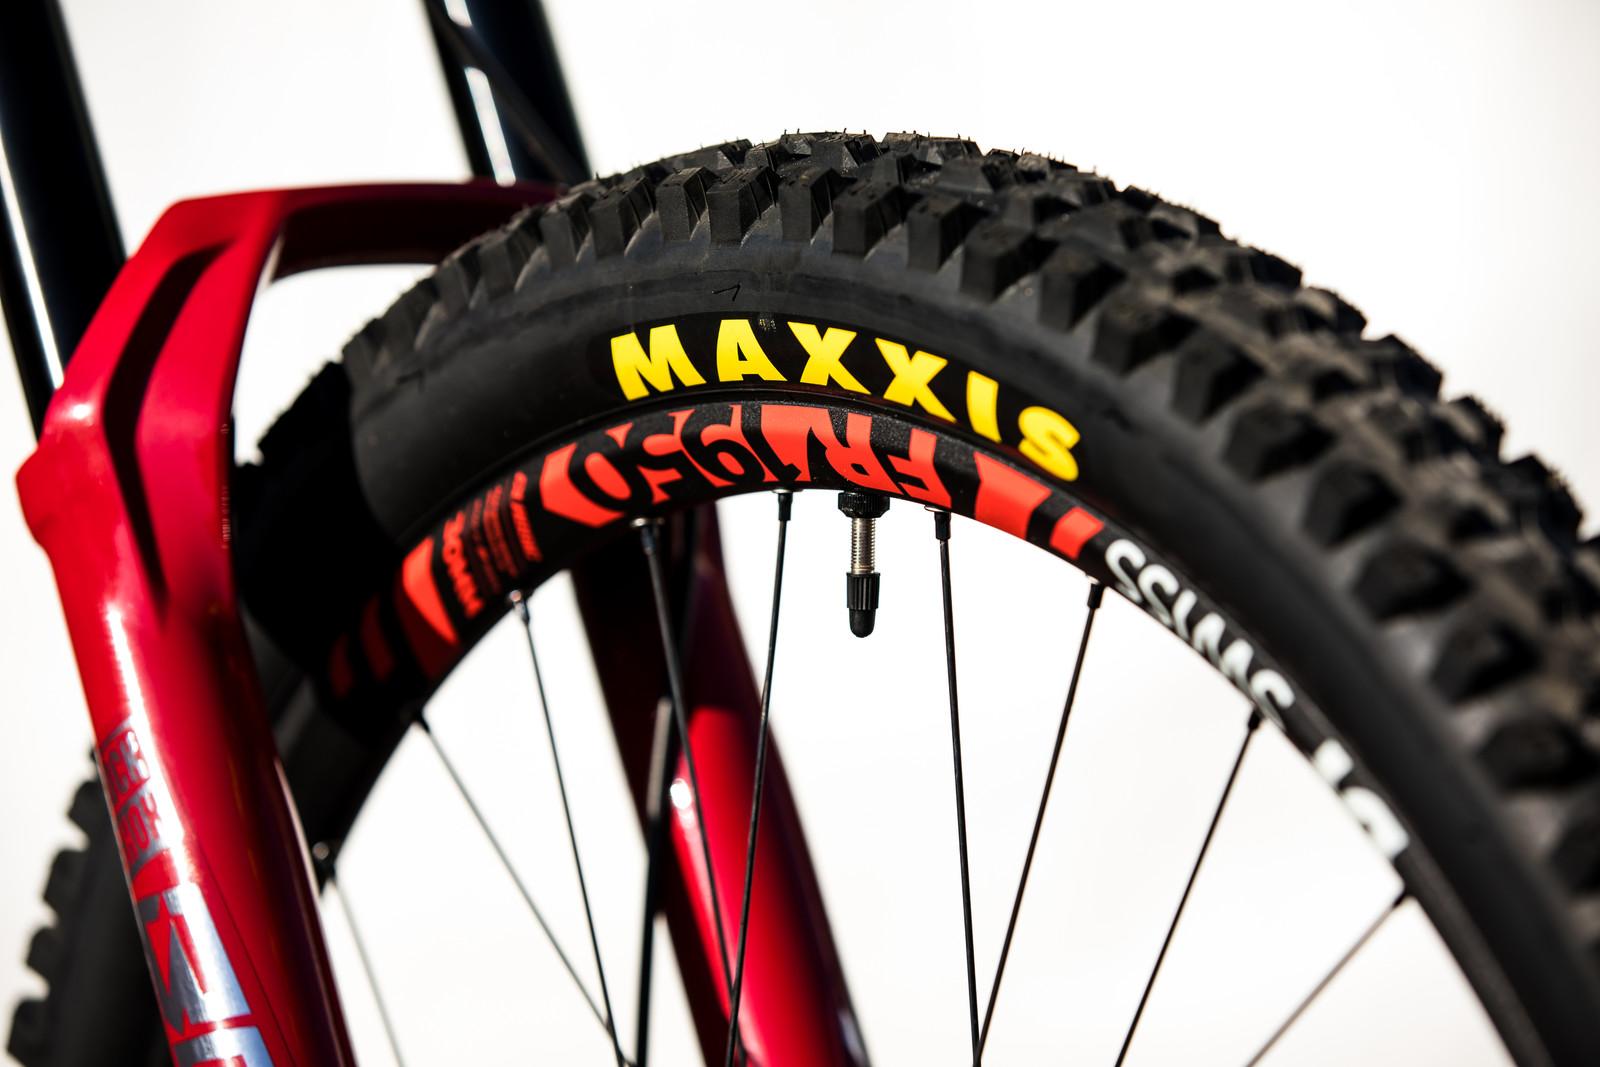 MSA19 BB020072 - Erik Irmisch's YT TUES at 2019 Worlds MSA - Mountain Biking Pictures - Vital MTB